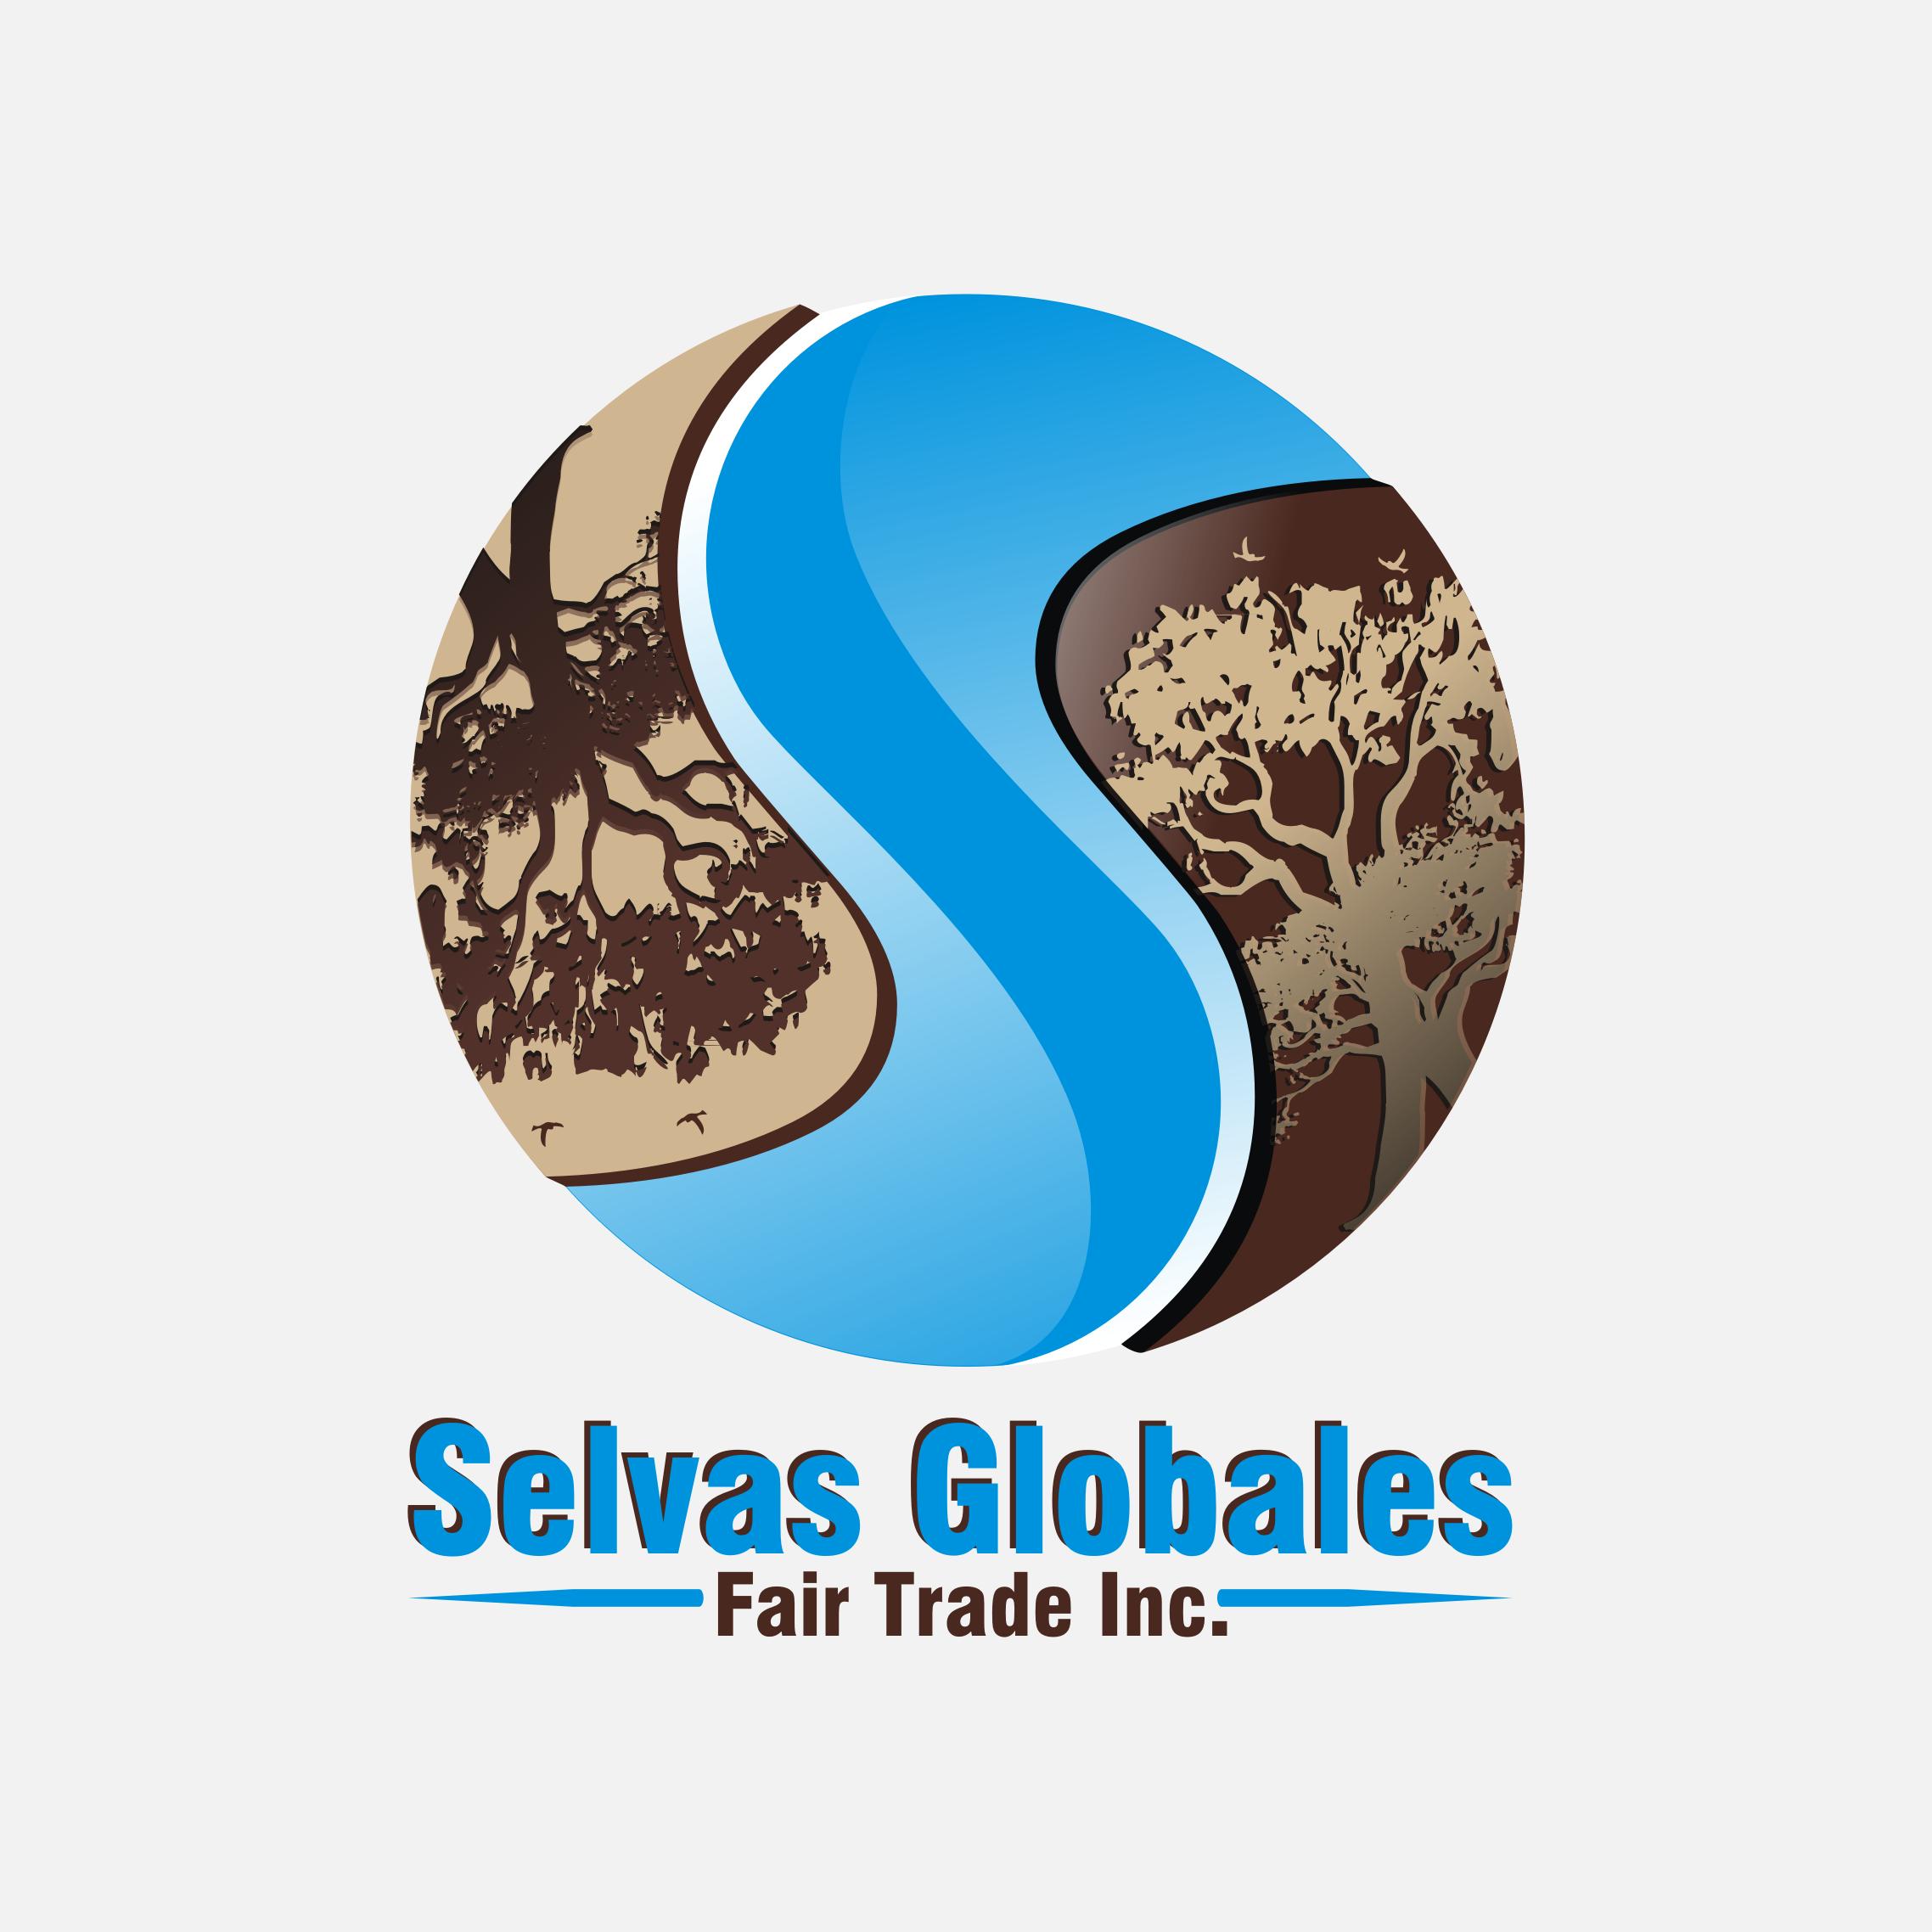 Logo Design by Private User - Entry No. 104 in the Logo Design Contest Captivating Logo Design for Selvas Globales Fair Trade Inc..